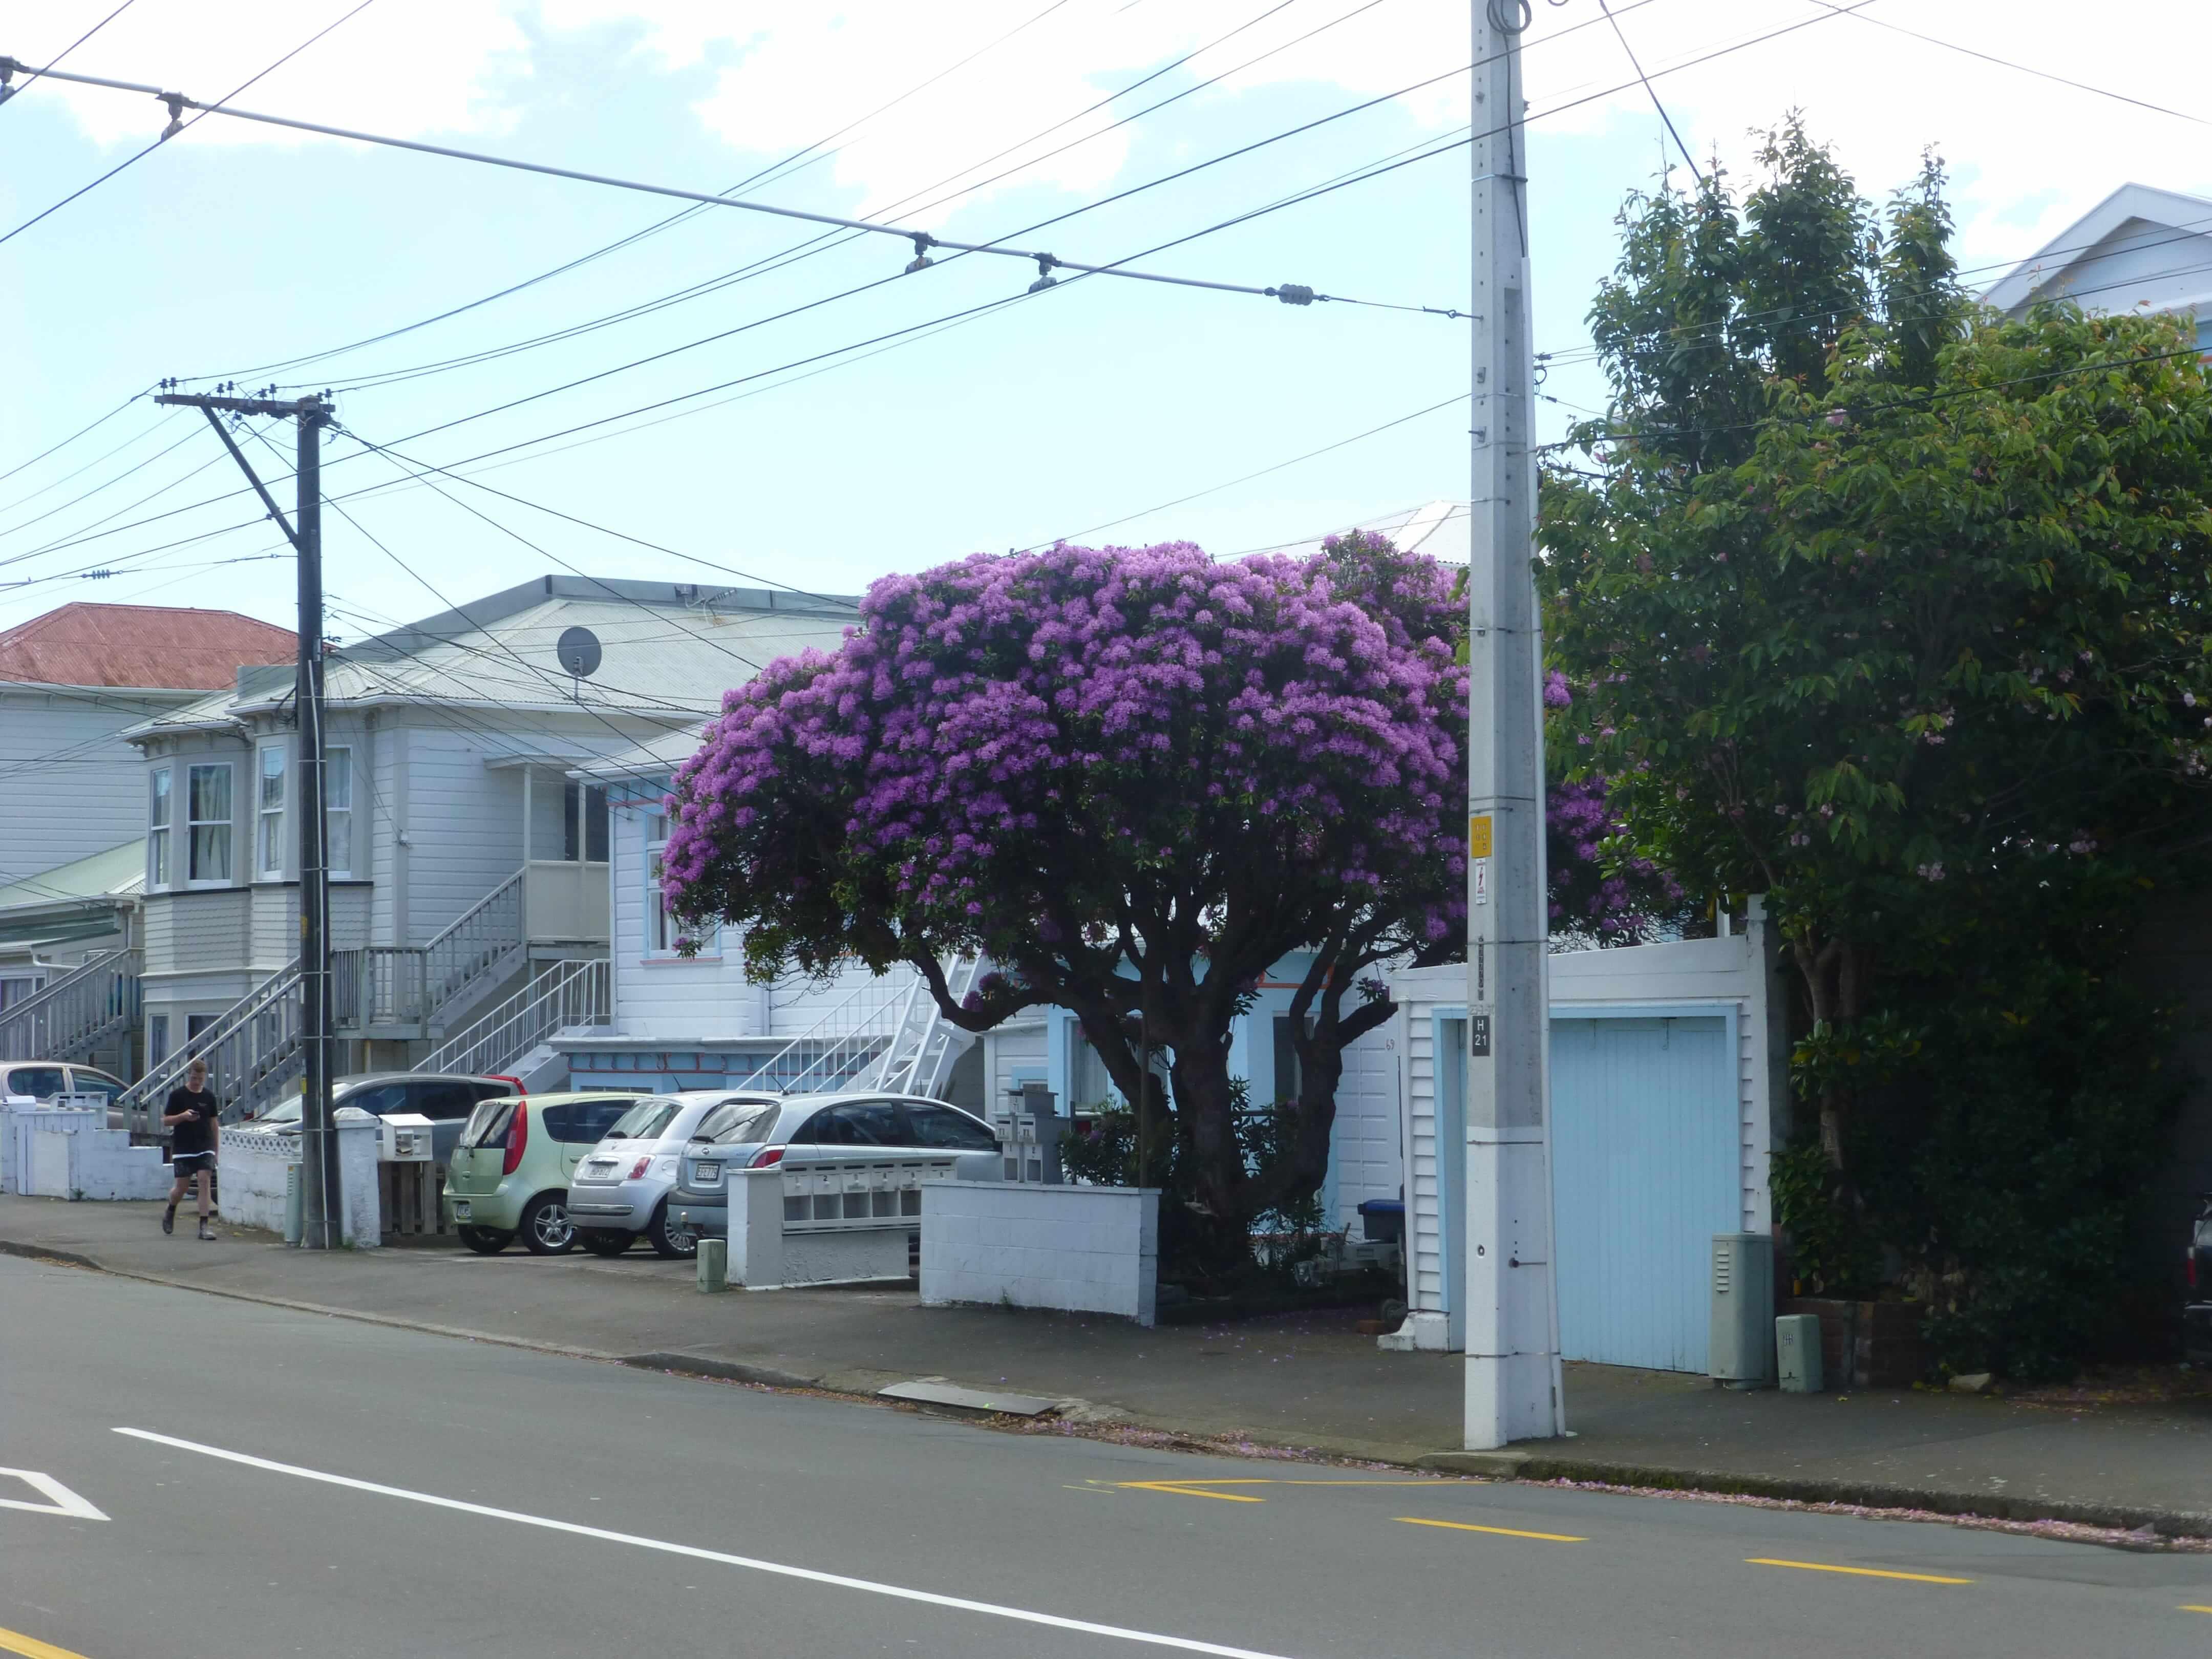 in Wellington, Neuseeland, Weit-weg.reisen 12